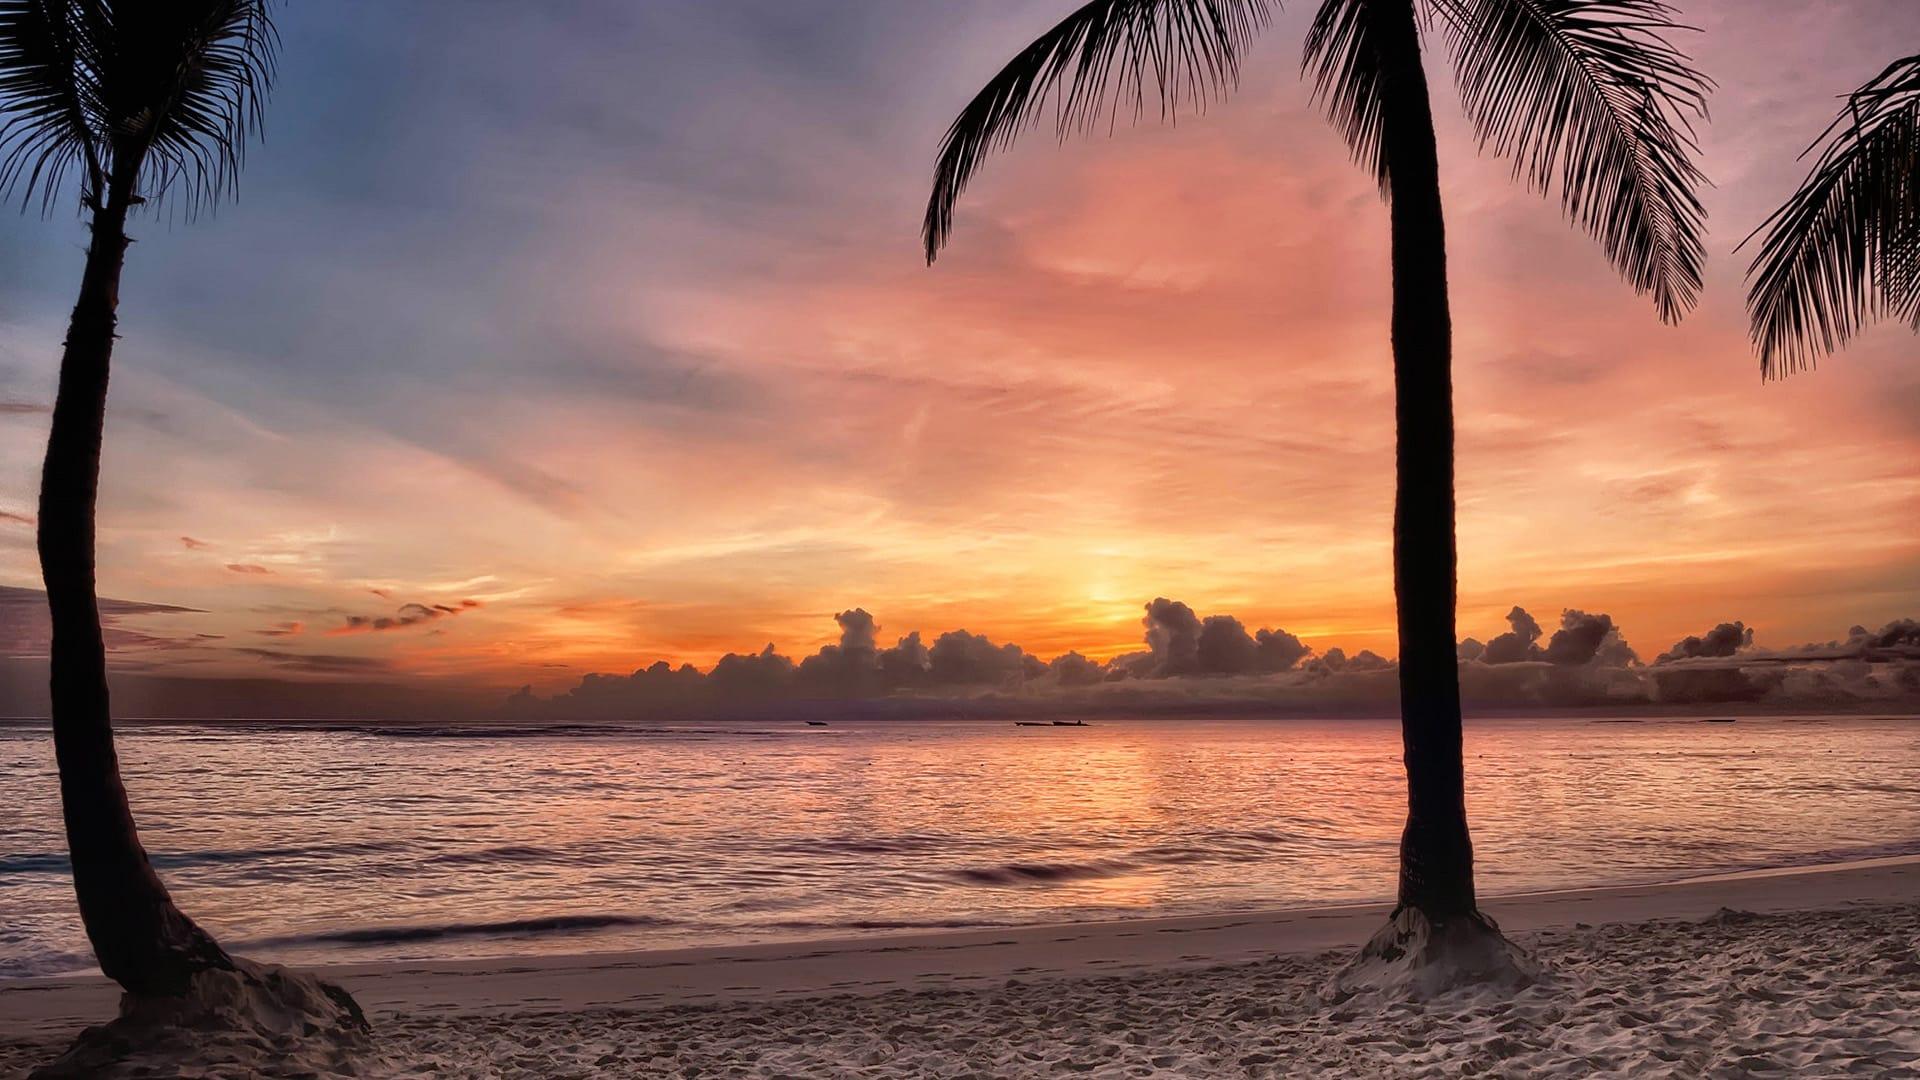 5 Easy Caribbean Getaways for a Last Minute Beach Vacation